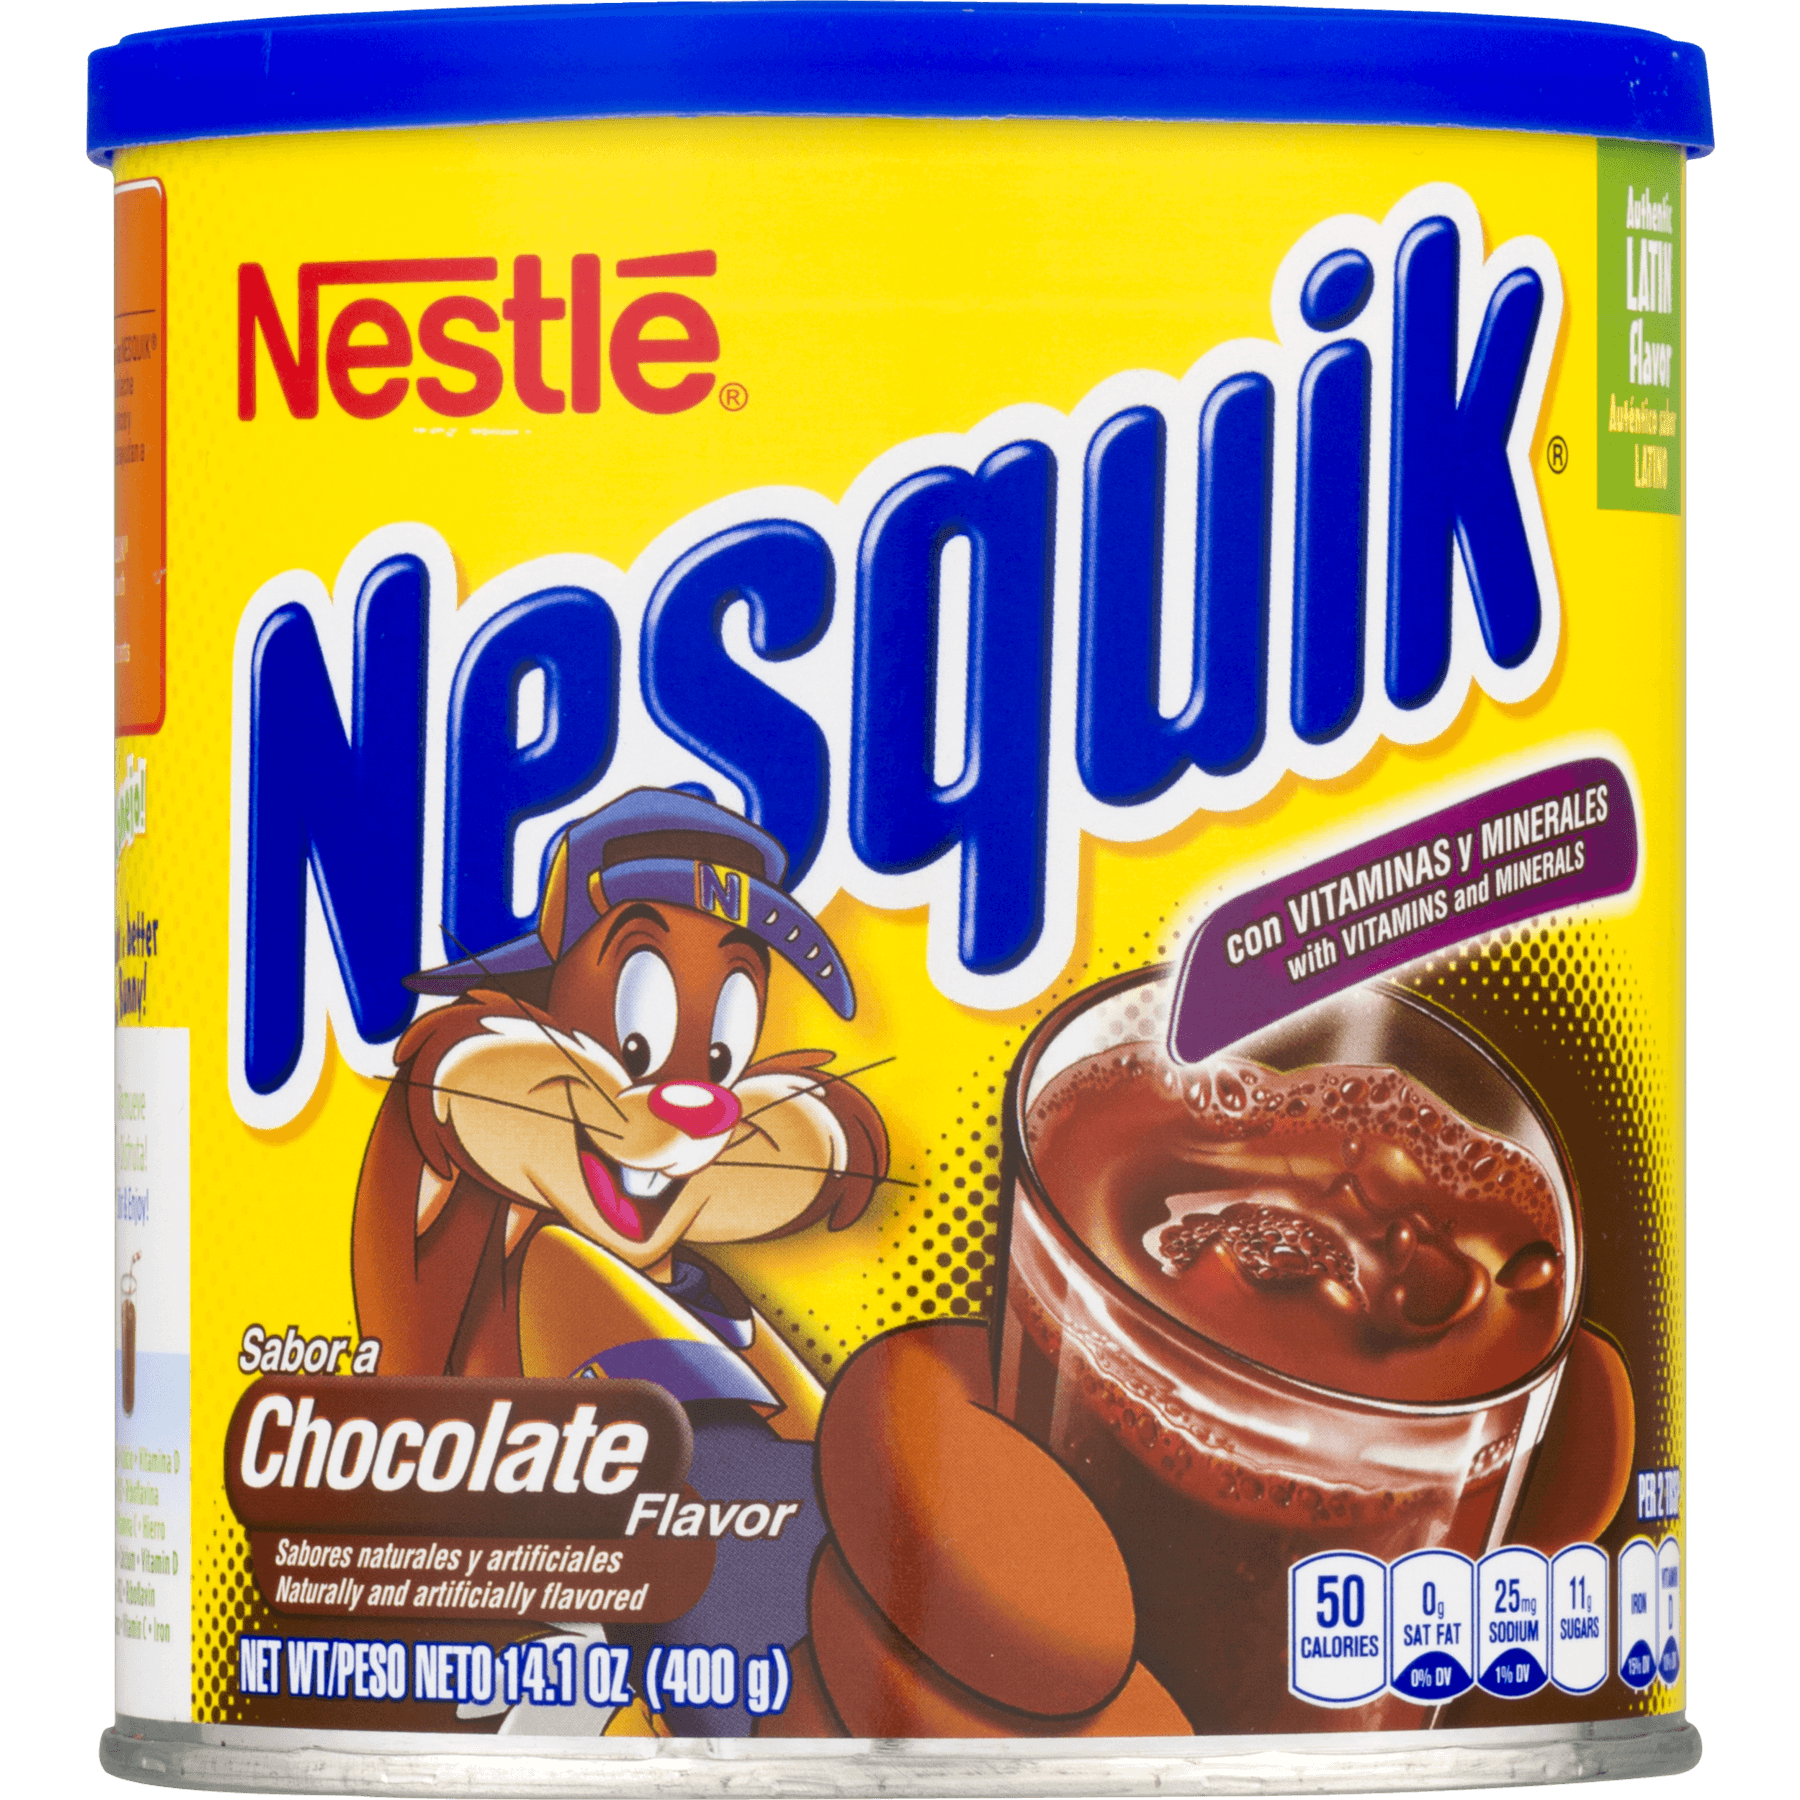 NESTLE NESQUIK Chocolate Flavor 14.1 oz. Canister